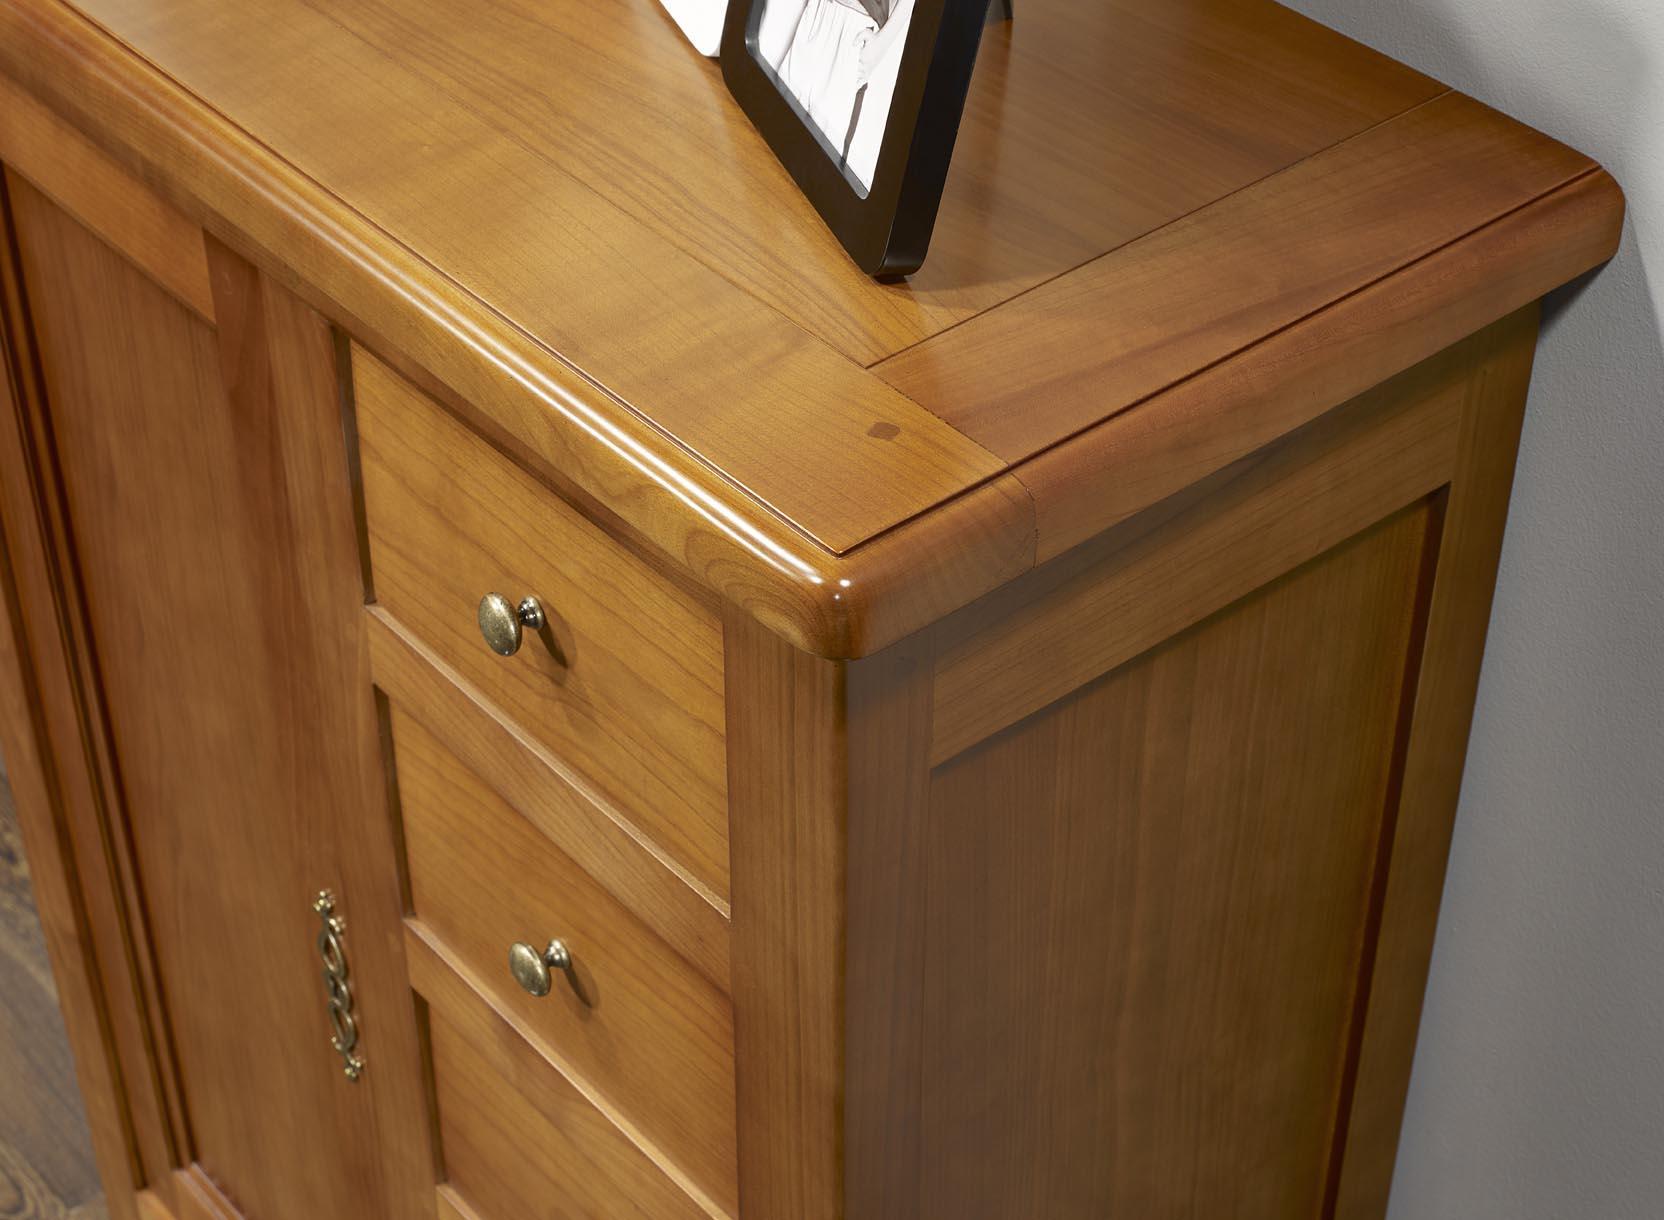 farinier 1 porte 5 tiroirs en merisier massif de style. Black Bedroom Furniture Sets. Home Design Ideas